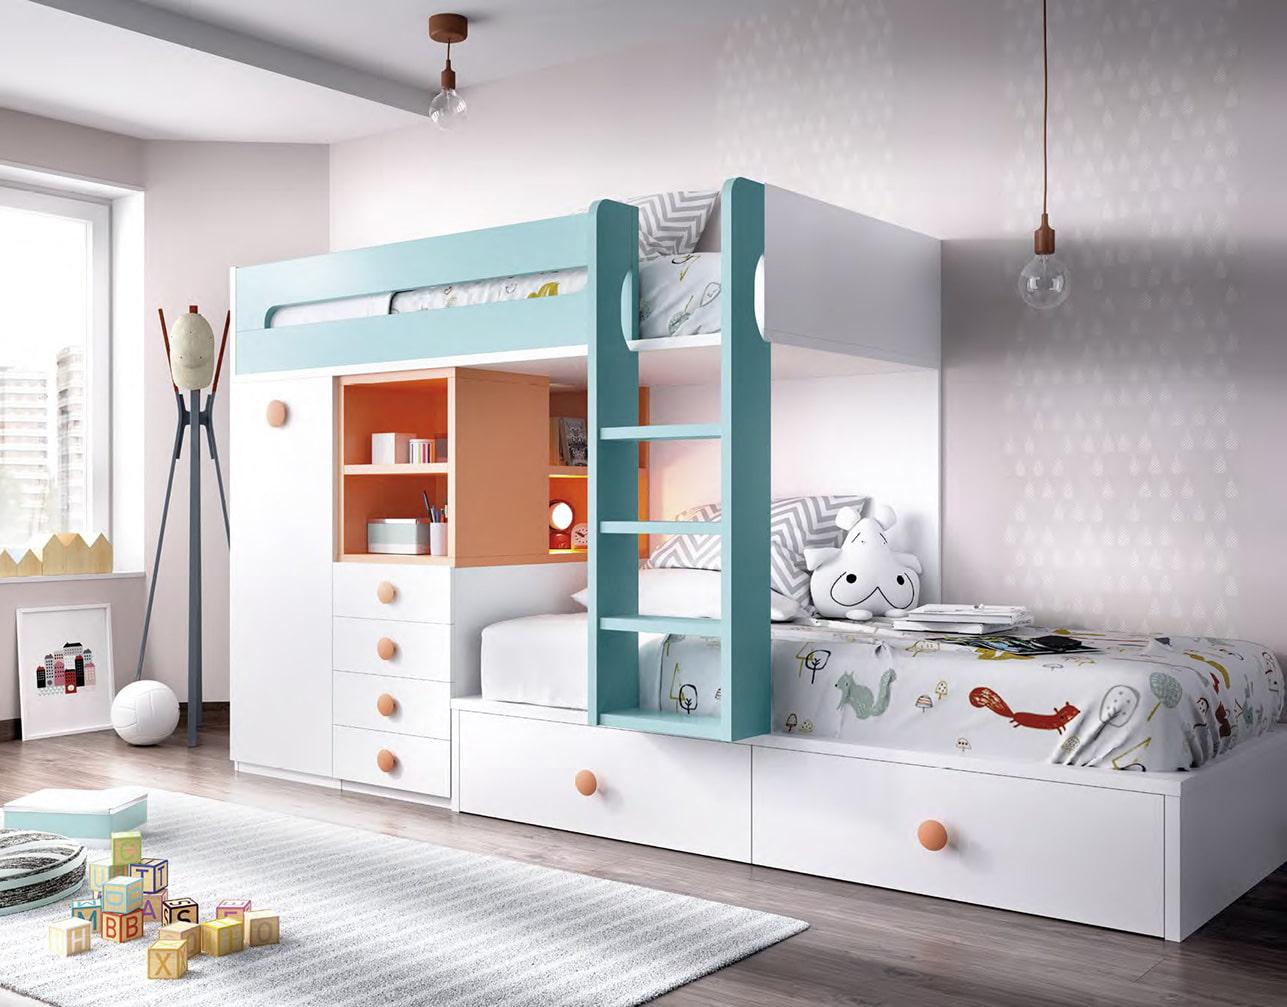 camas-block-Mundo-Joven-muebles-paco-caballero-512-5caf6815103b7